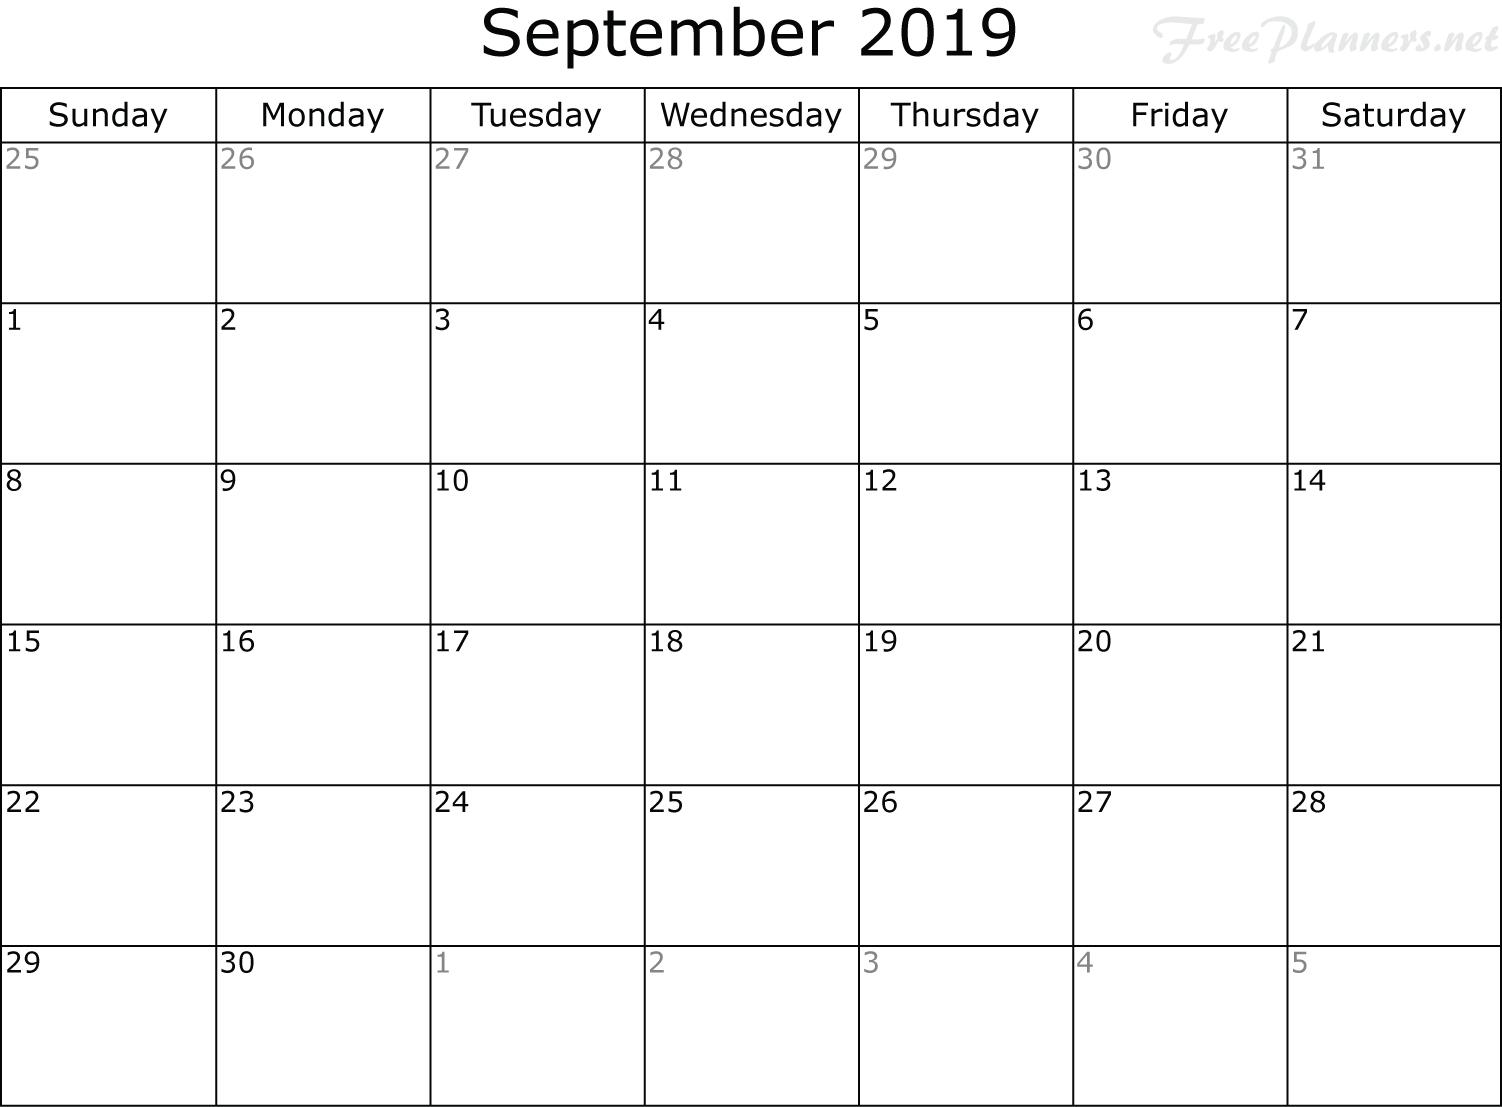 Calendar Planner September 2019.2019 Monthly Calendar Monthly Calendar Planner Free Planners